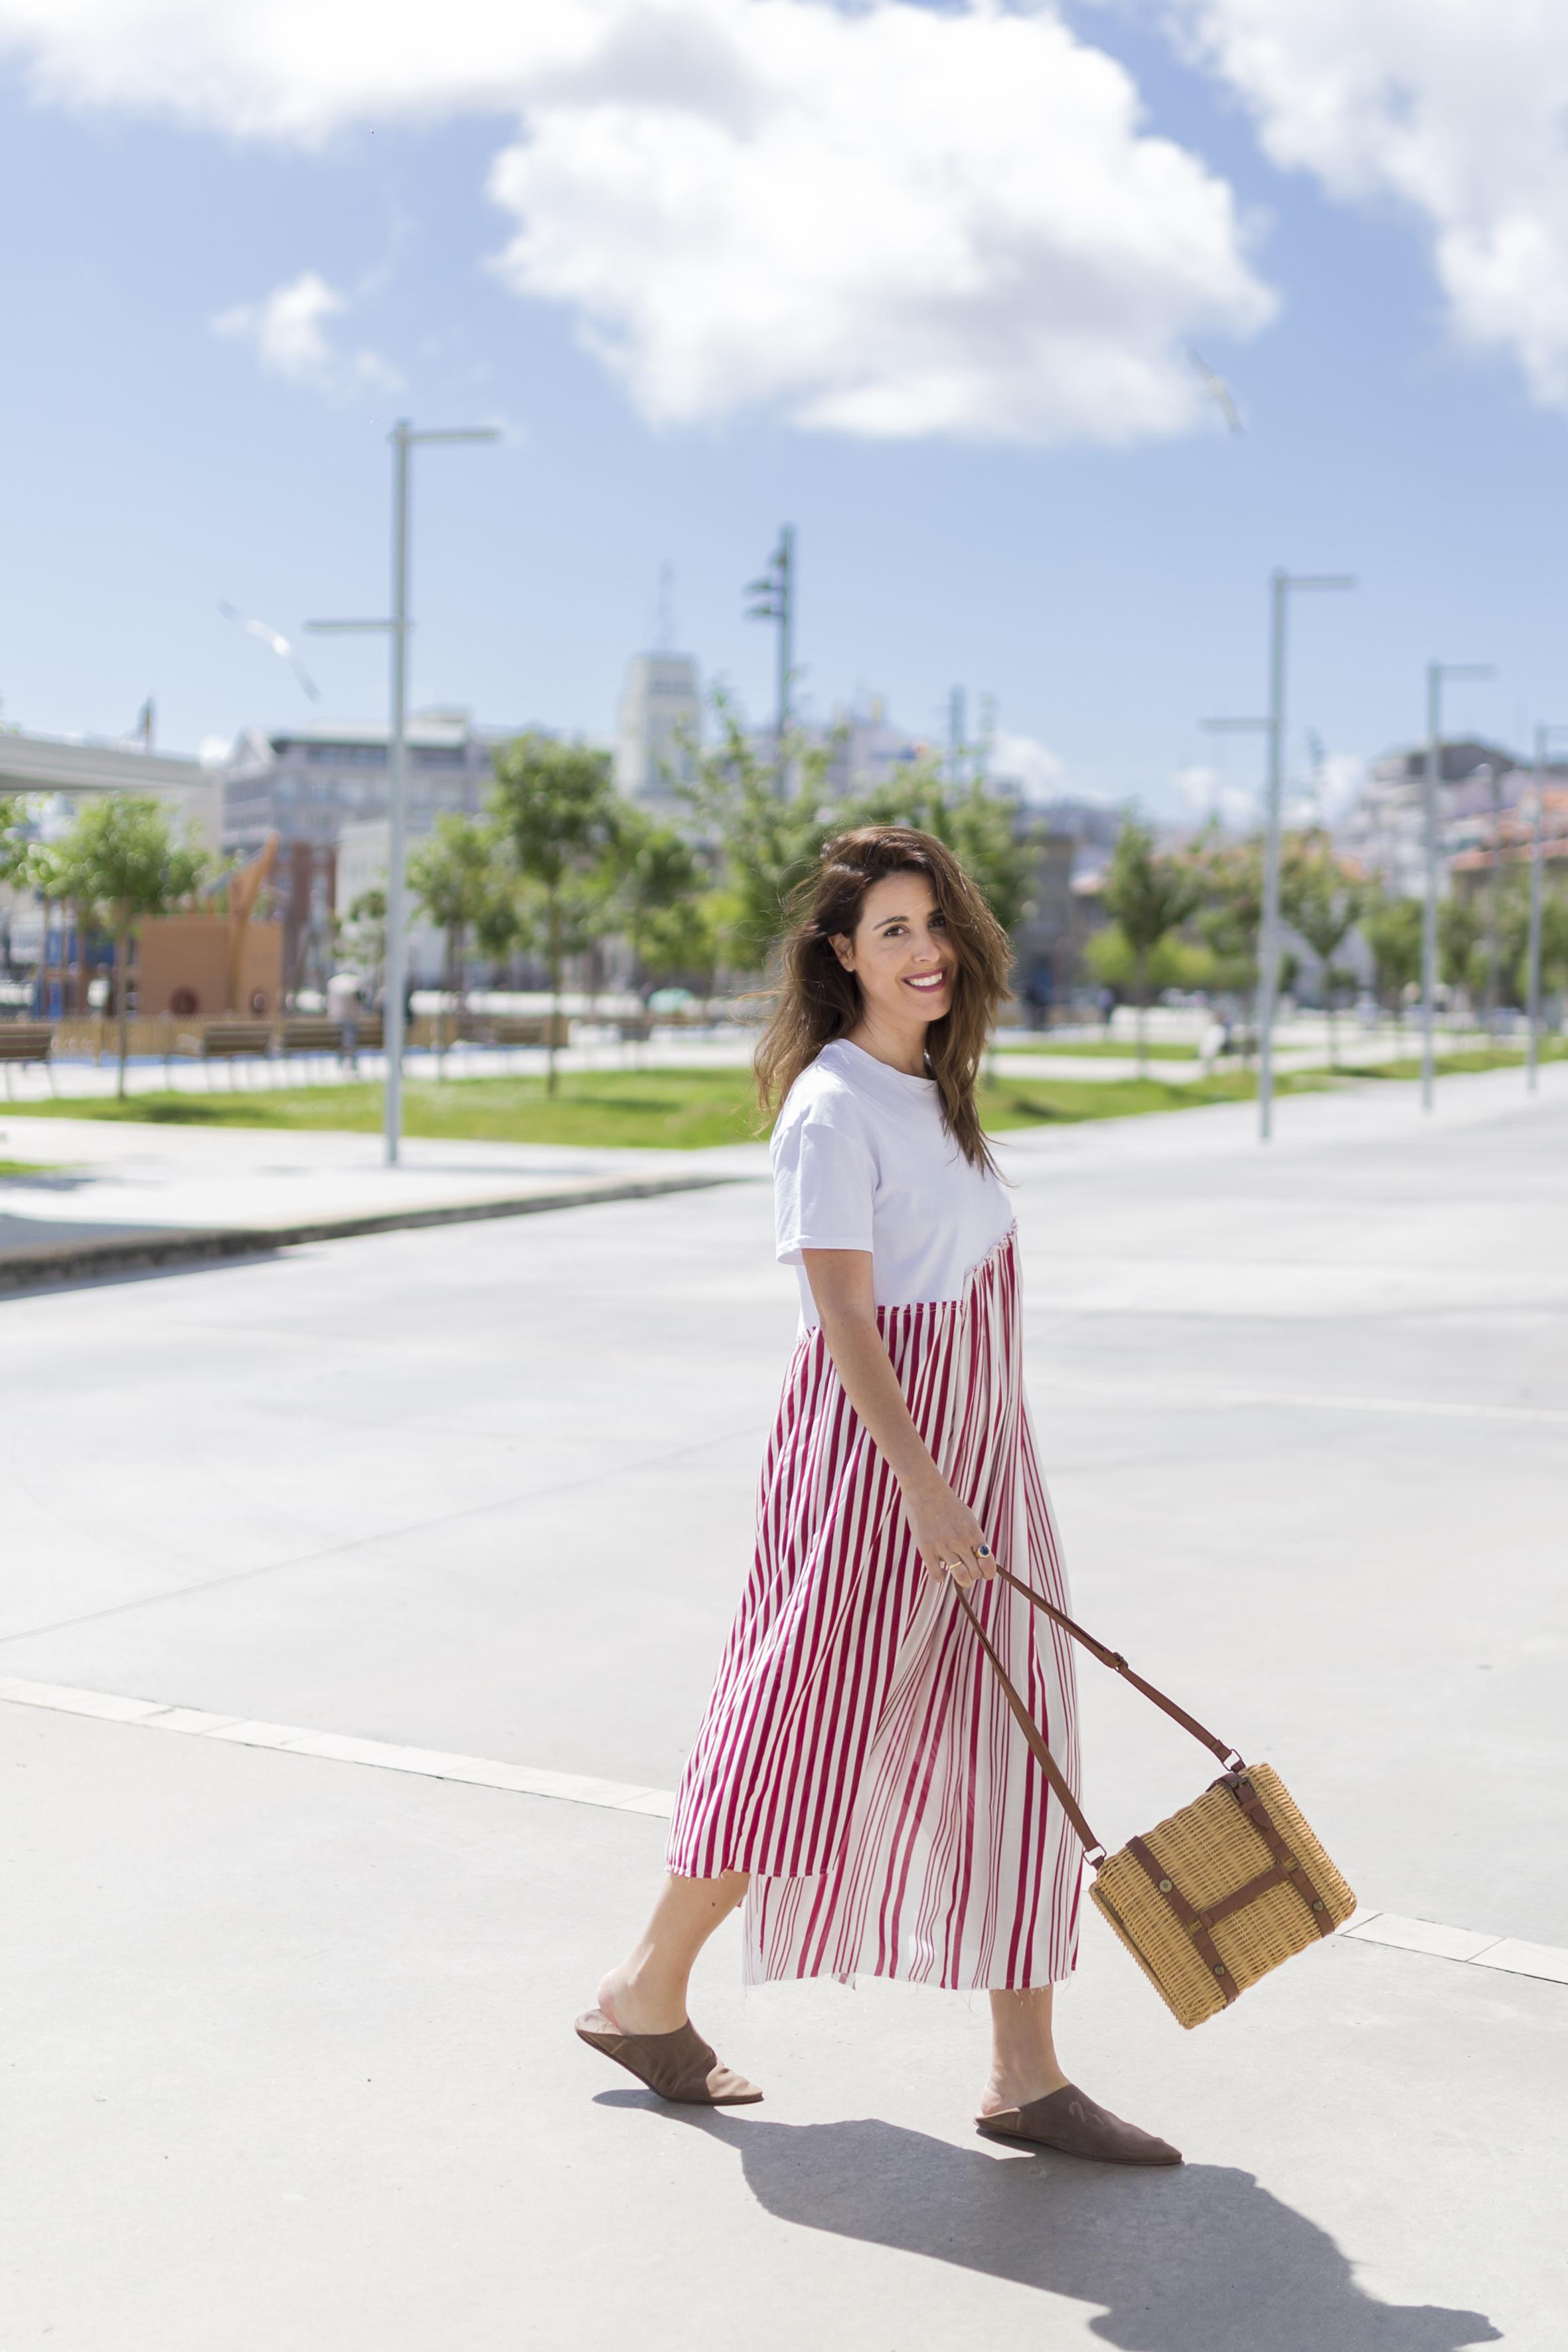 alba cuesta · babuchas · blogger · blanco · descalza look · estilista · fashion · marruecos · outfit · rayas · street style · zara